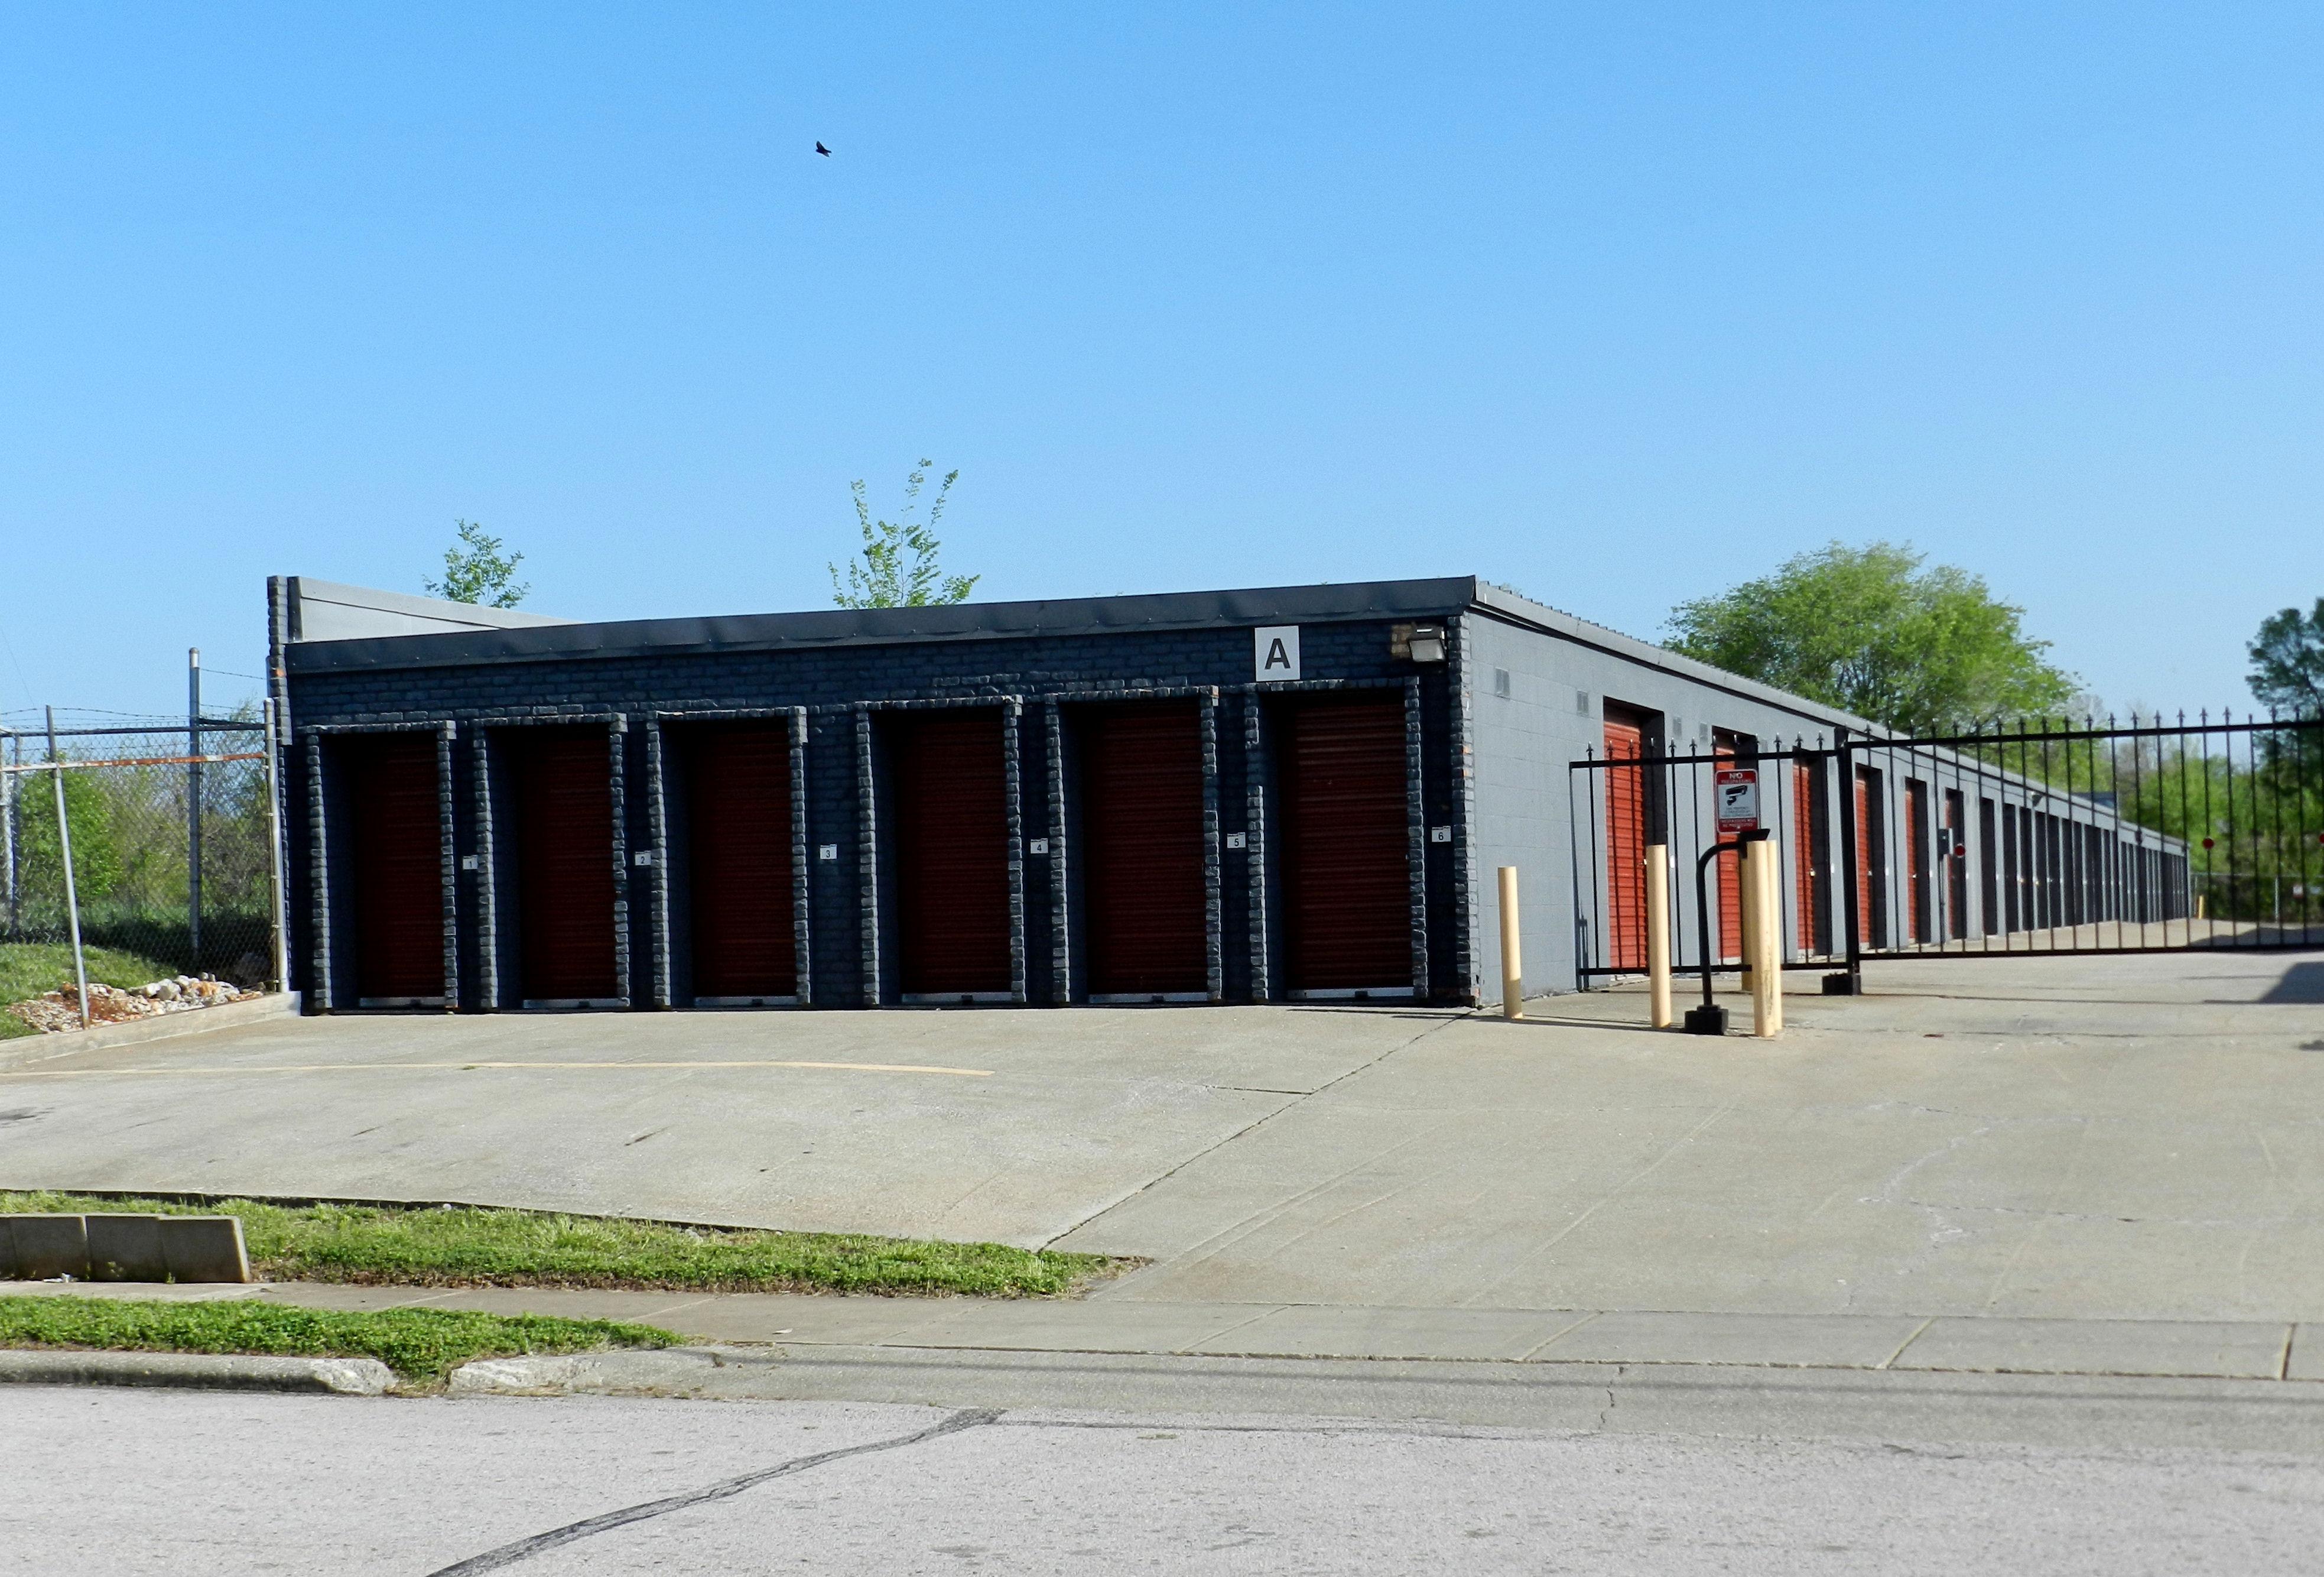 storagemart in springfield mo 417 831 4. Black Bedroom Furniture Sets. Home Design Ideas